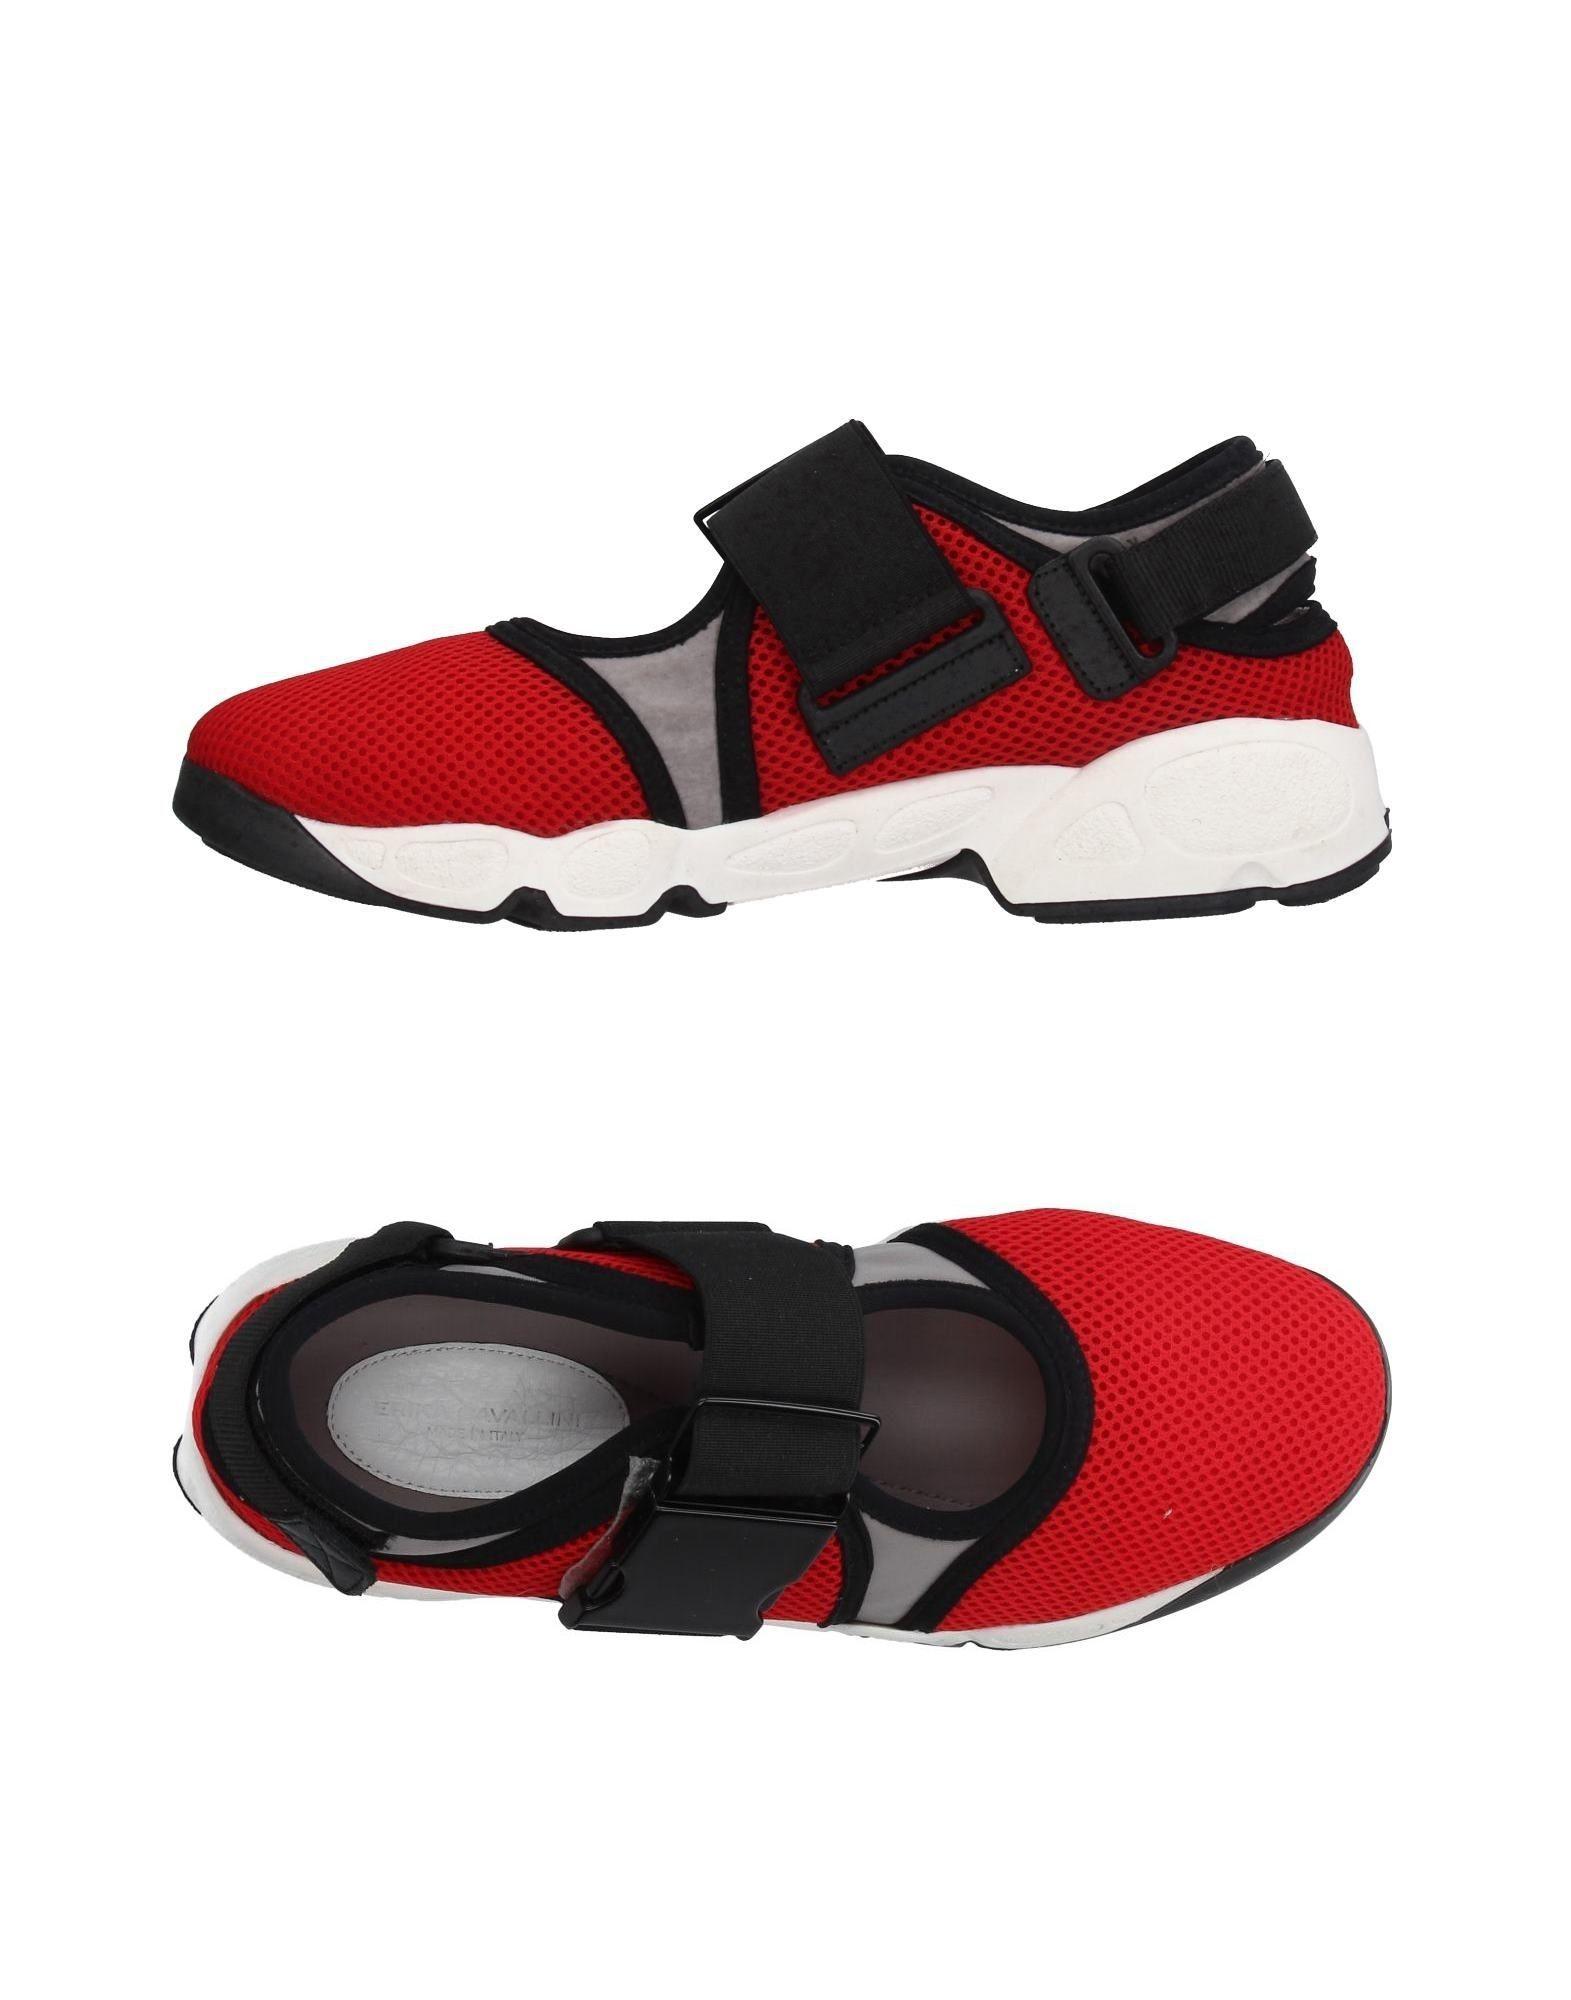 Erika Cavallini Sneakers Damen  11216169WV Gute Qualität beliebte Schuhe